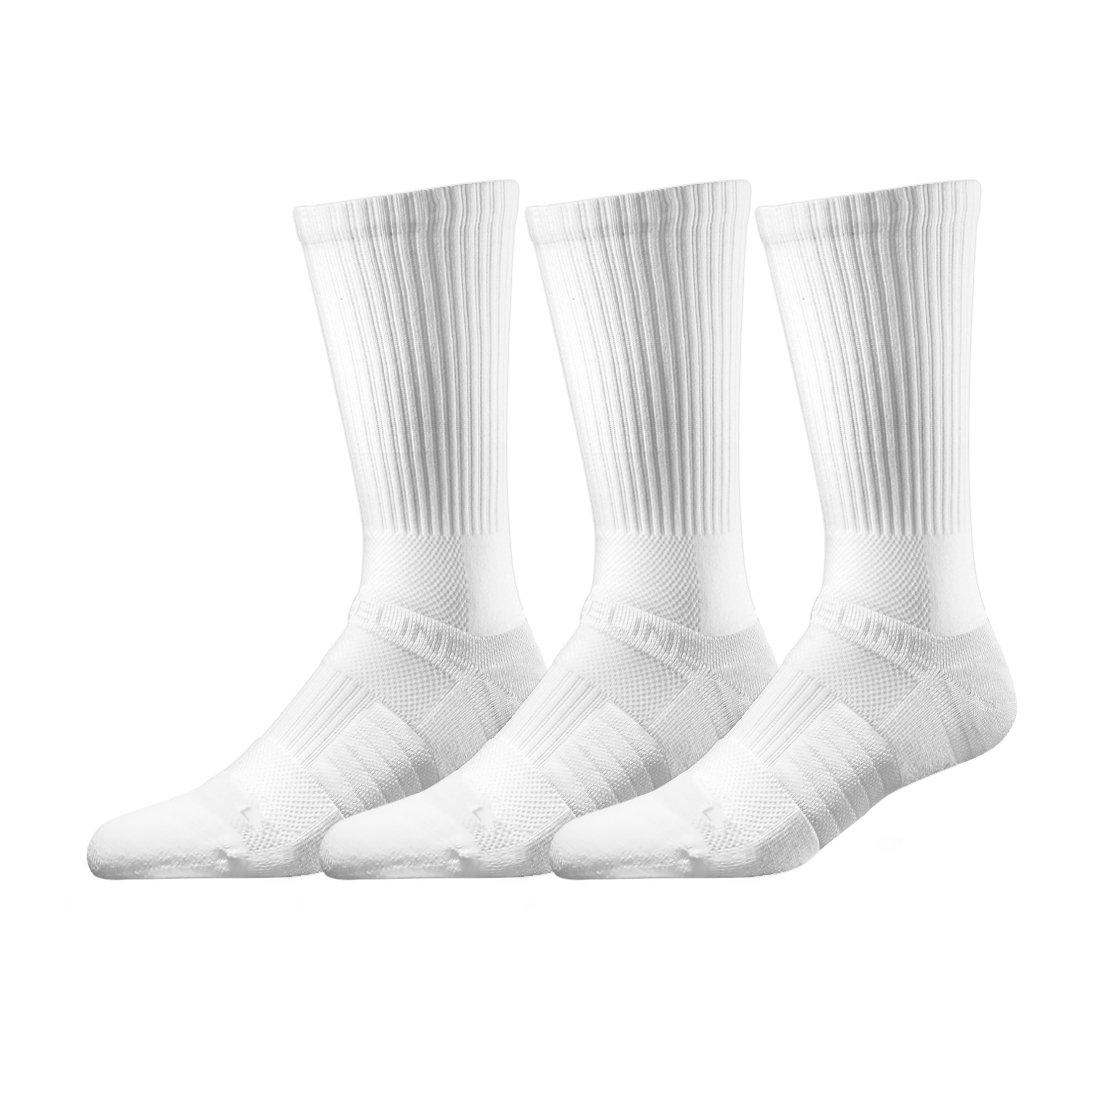 Strideline Standard Issue Crew 3-Pack, One Size, Standard, White N013330